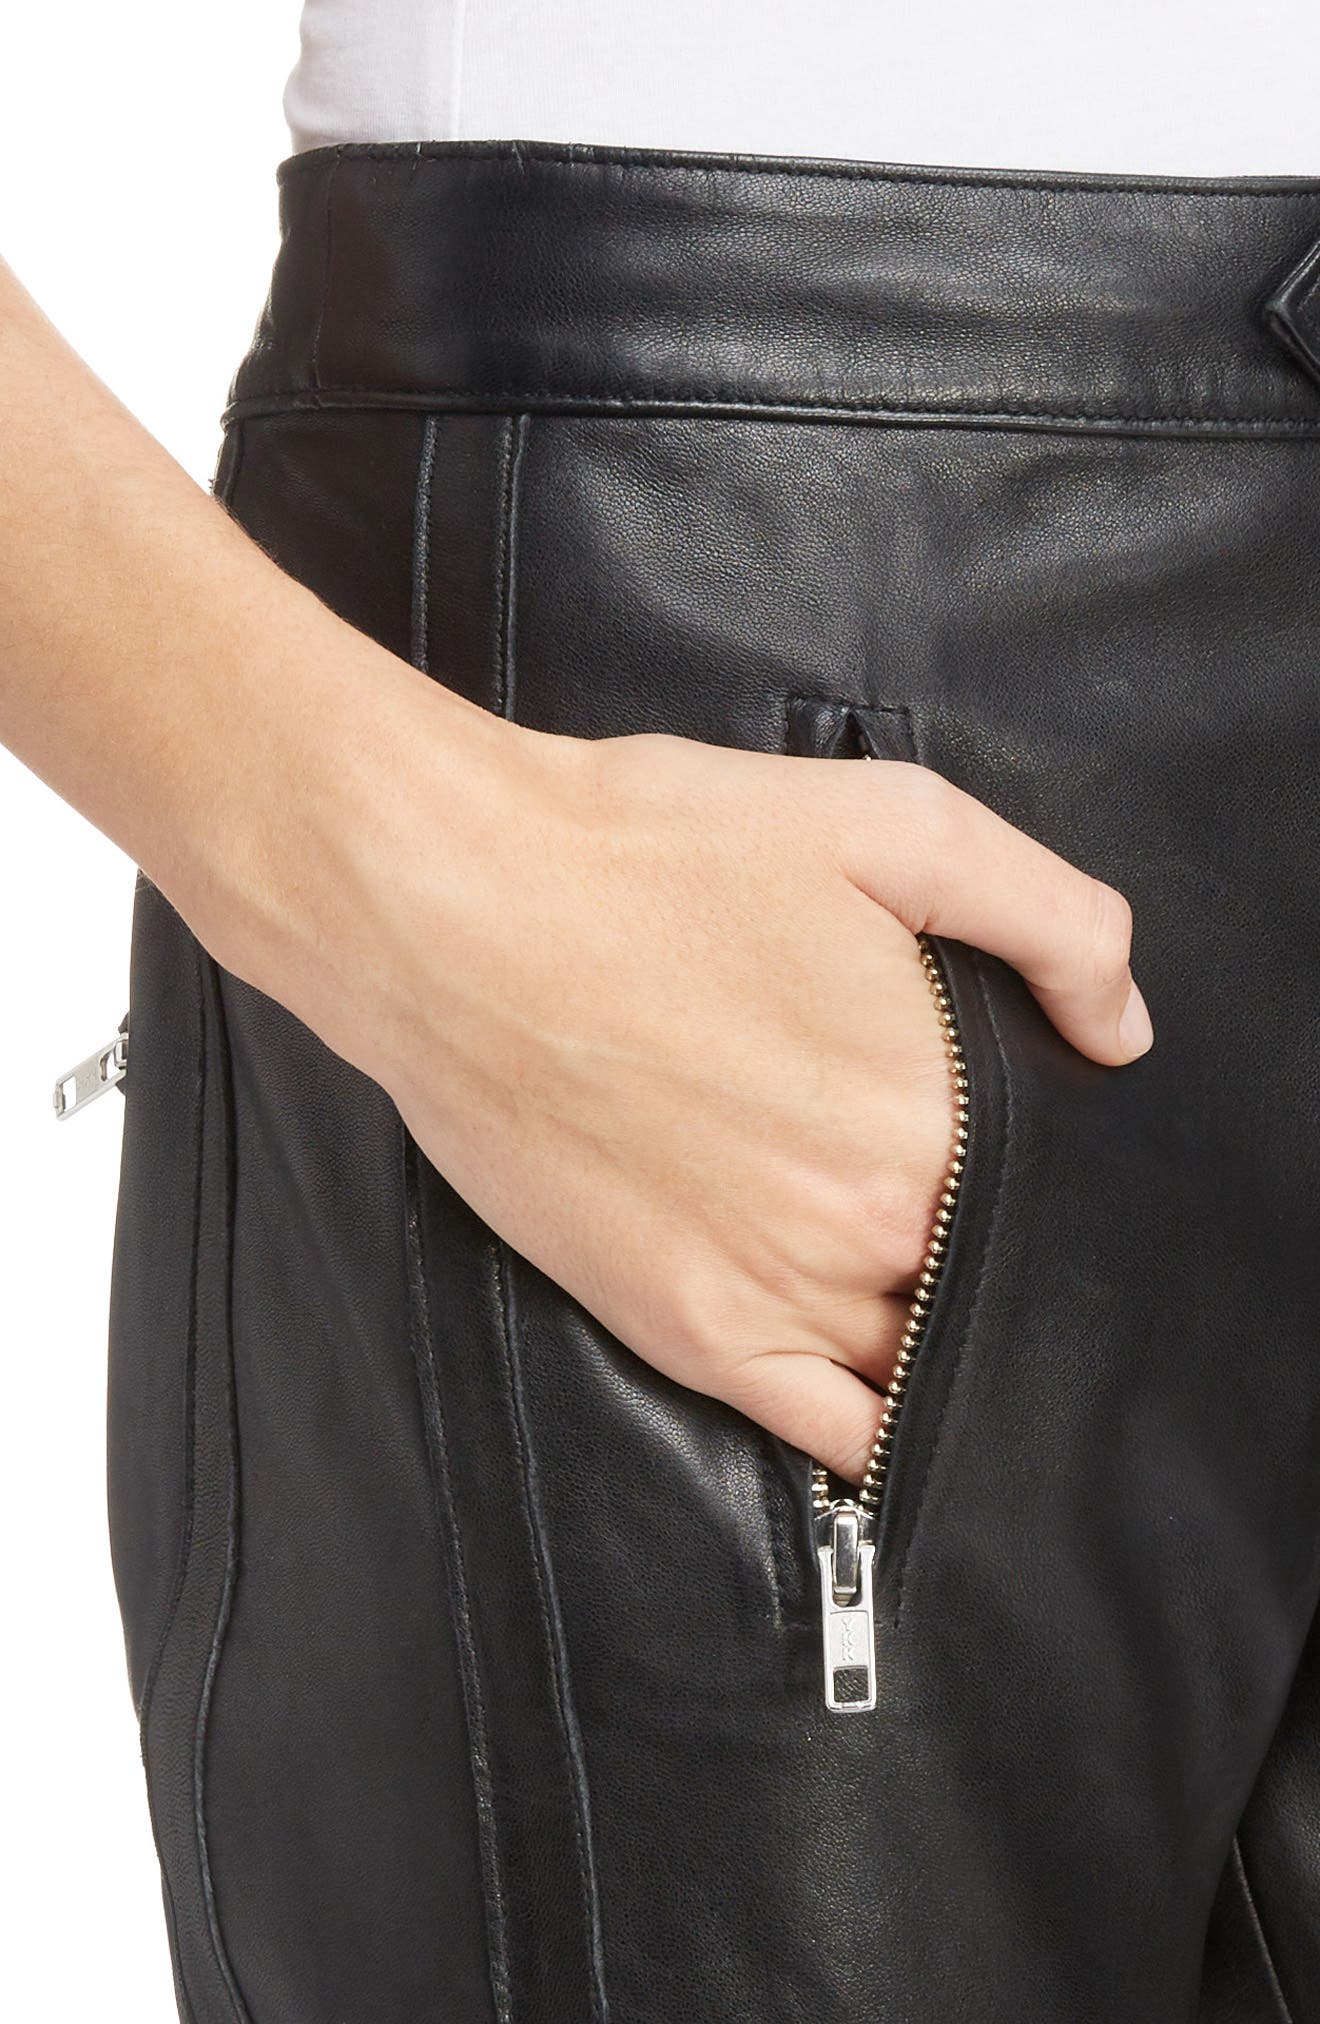 Isabel Marant Étoile Aya Leather Pants,                             Alternate thumbnail 4, color,                             BLACK